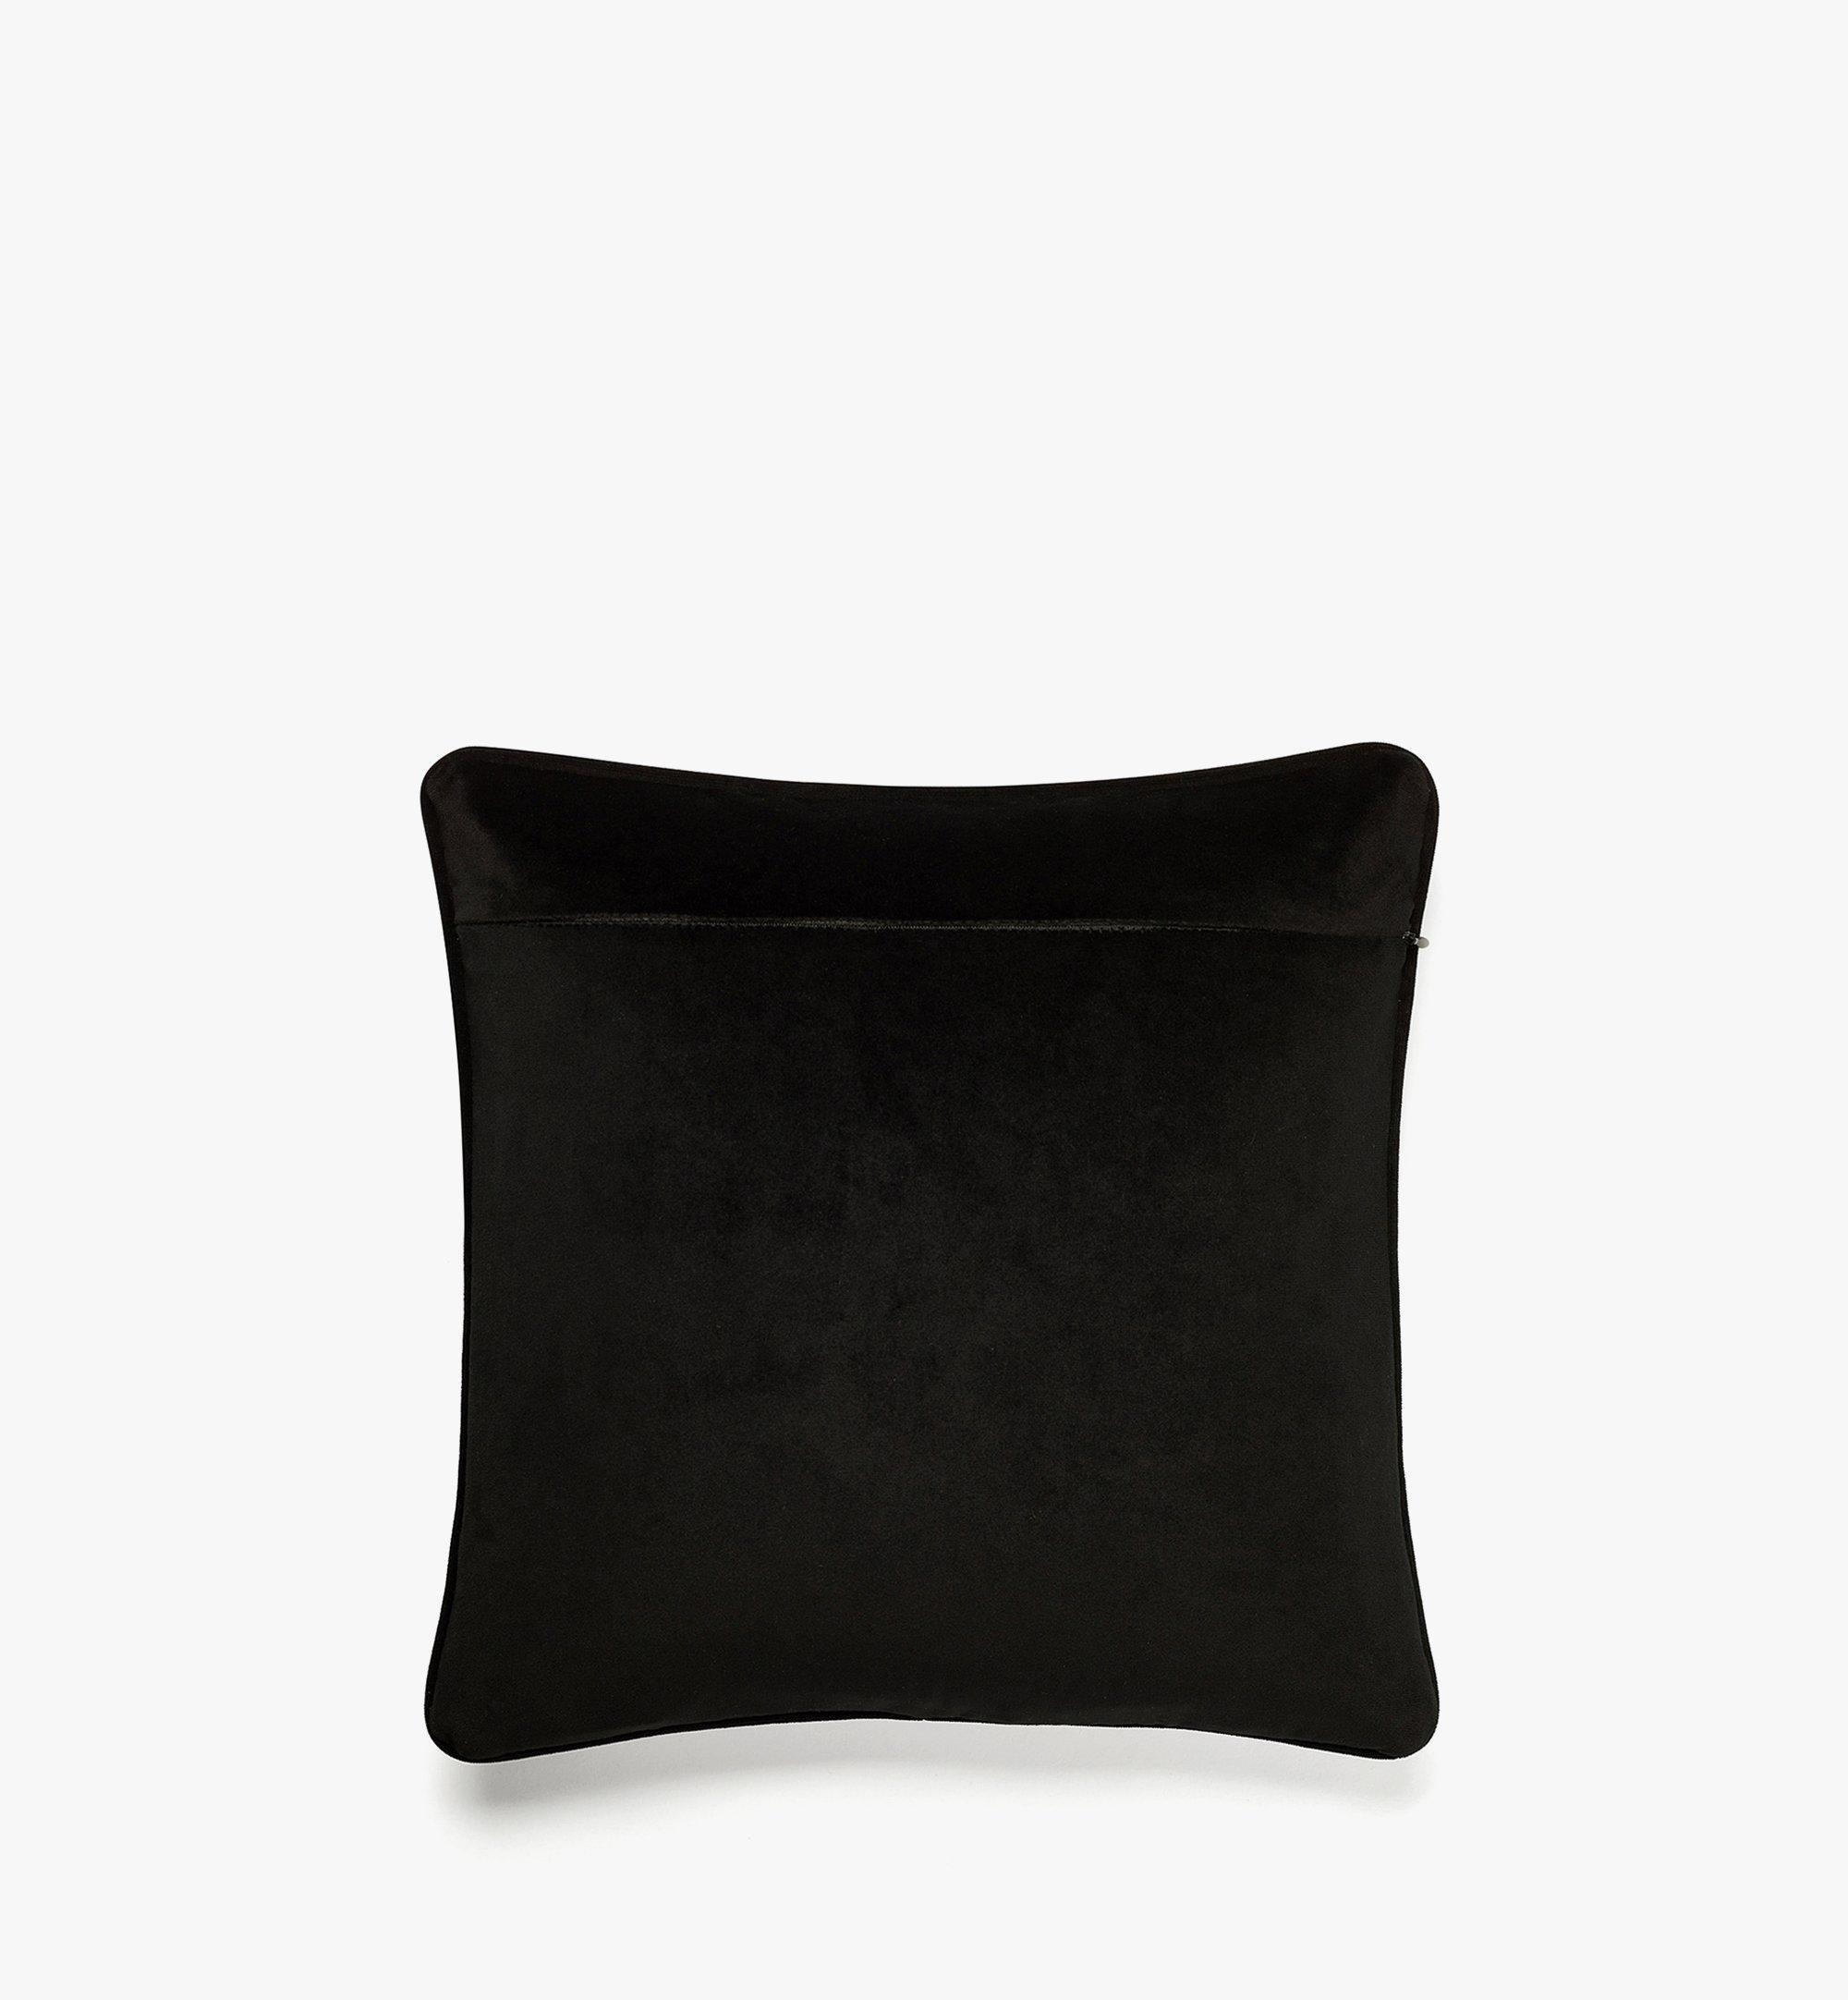 MCM MCM x SAMBYPEN Pillow Cushion in Visetos Cognac MEZBASP03CO001 Alternate View 2